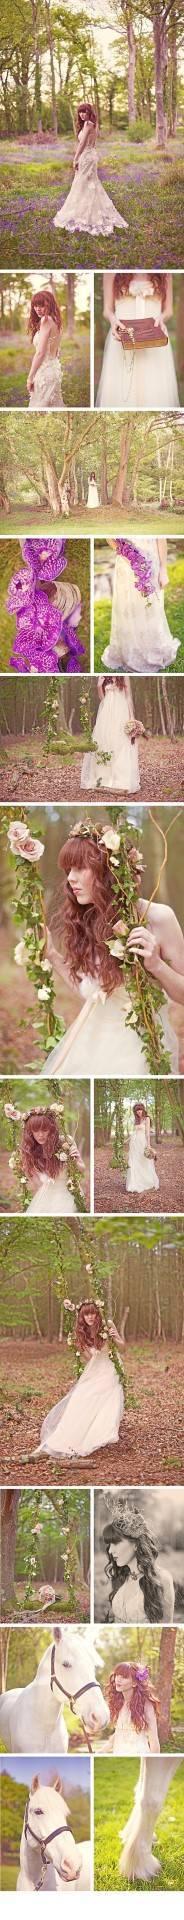 Enchanted Woodland Styled Shoot {Sarah Gawler Photography}